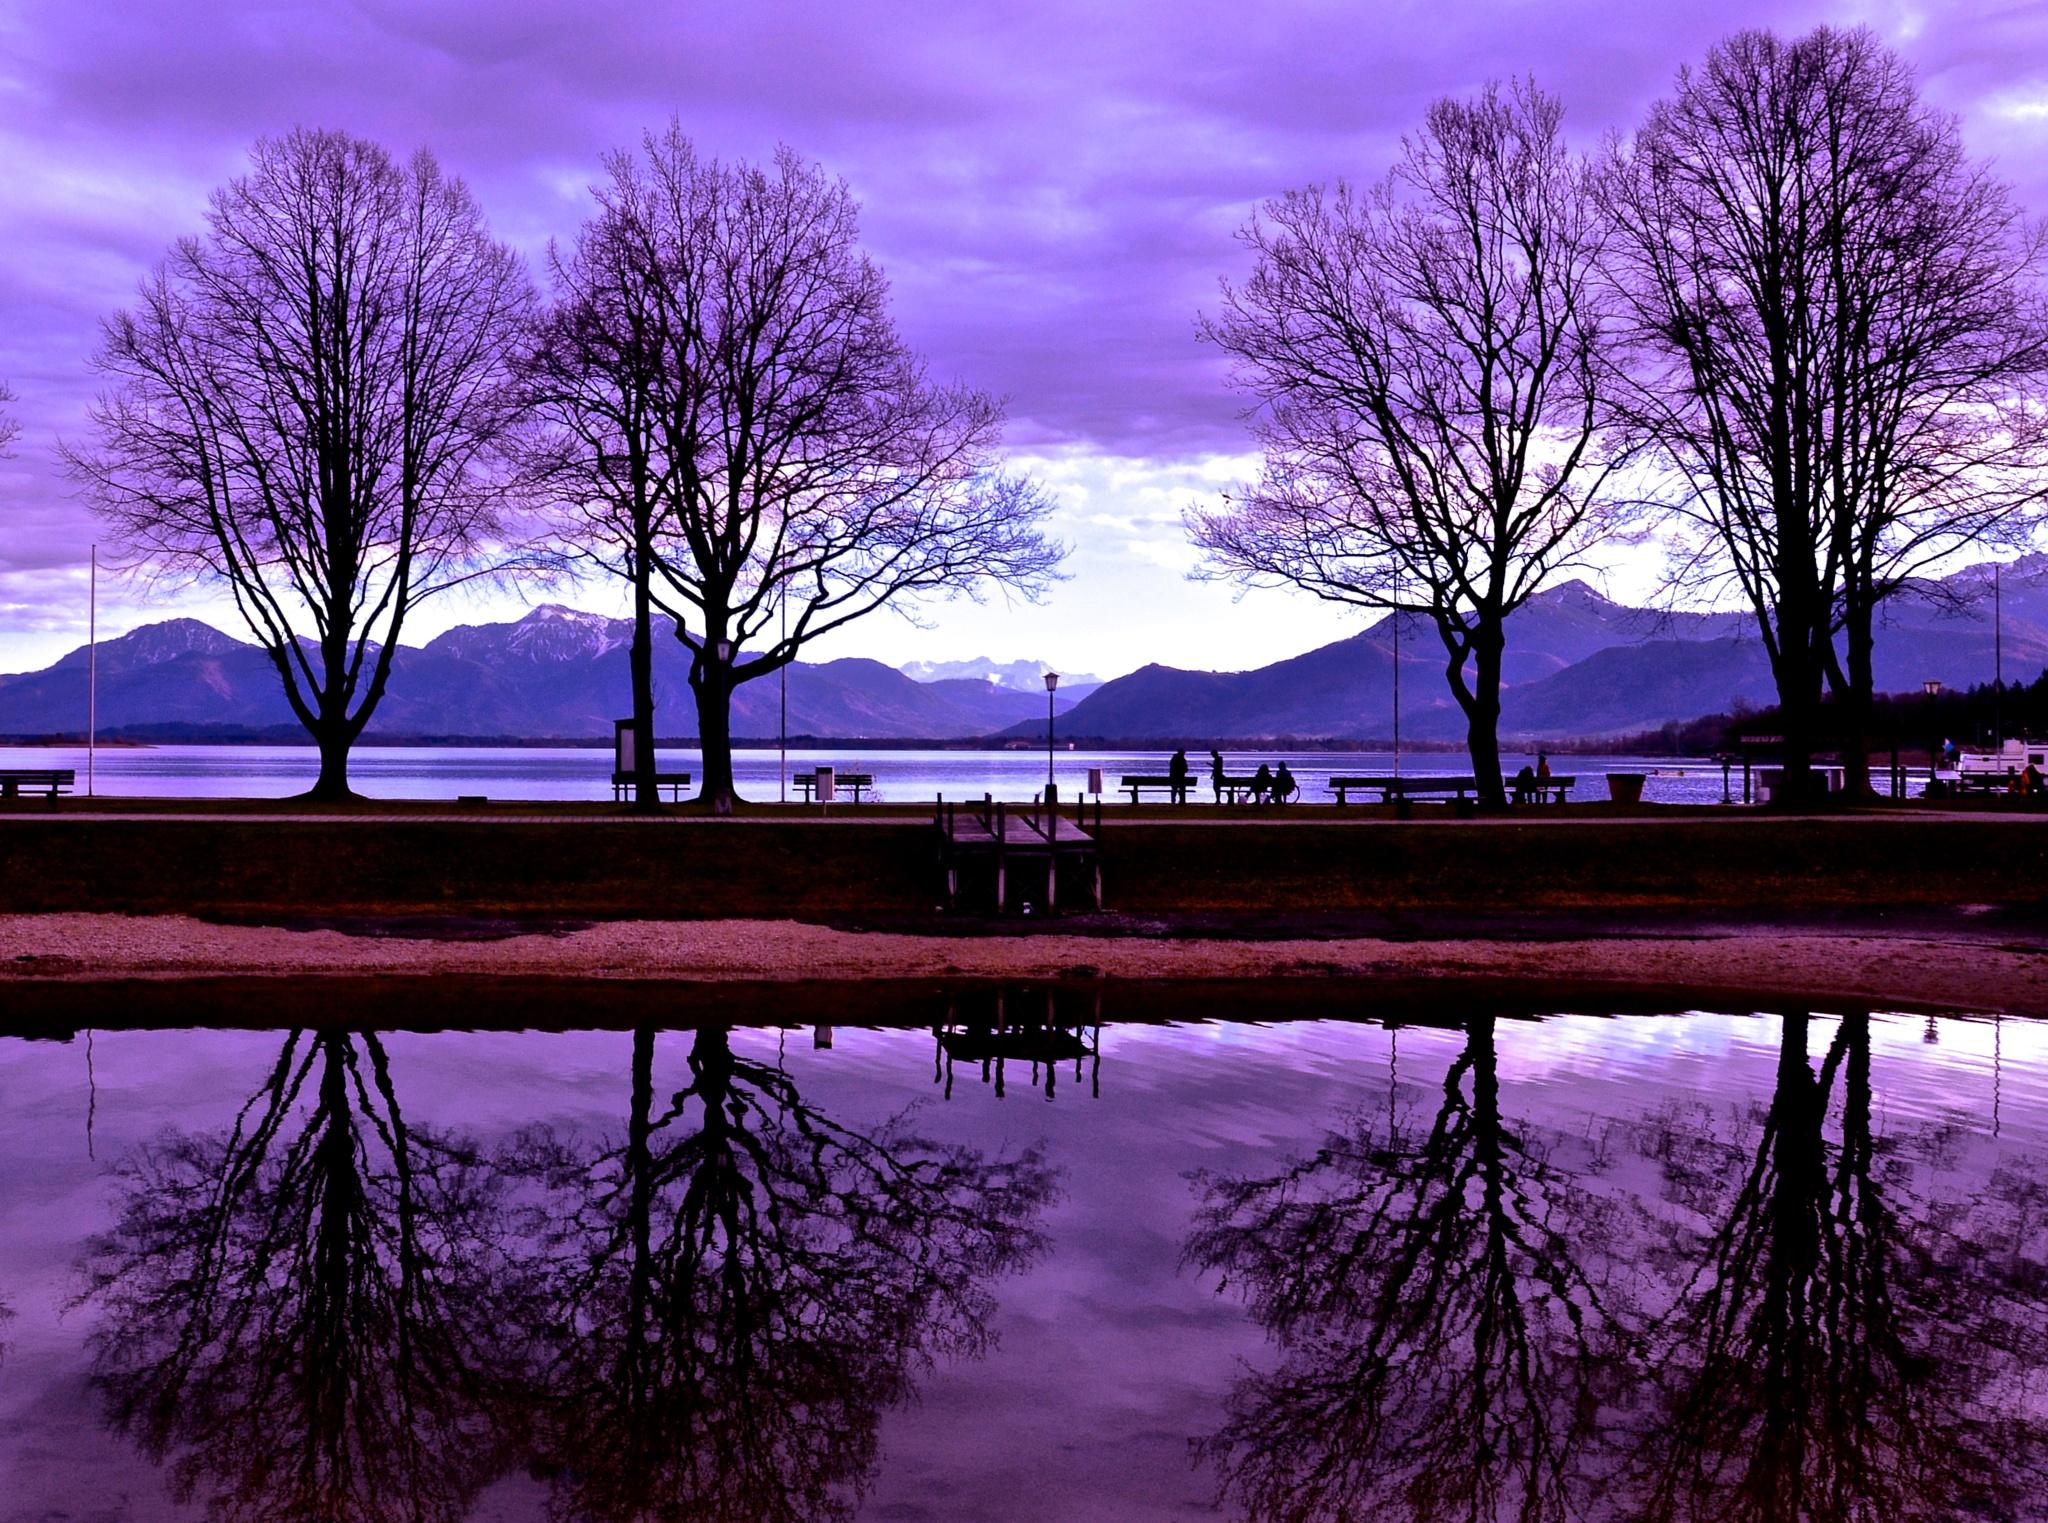 Purple Rain by justashadowfestival